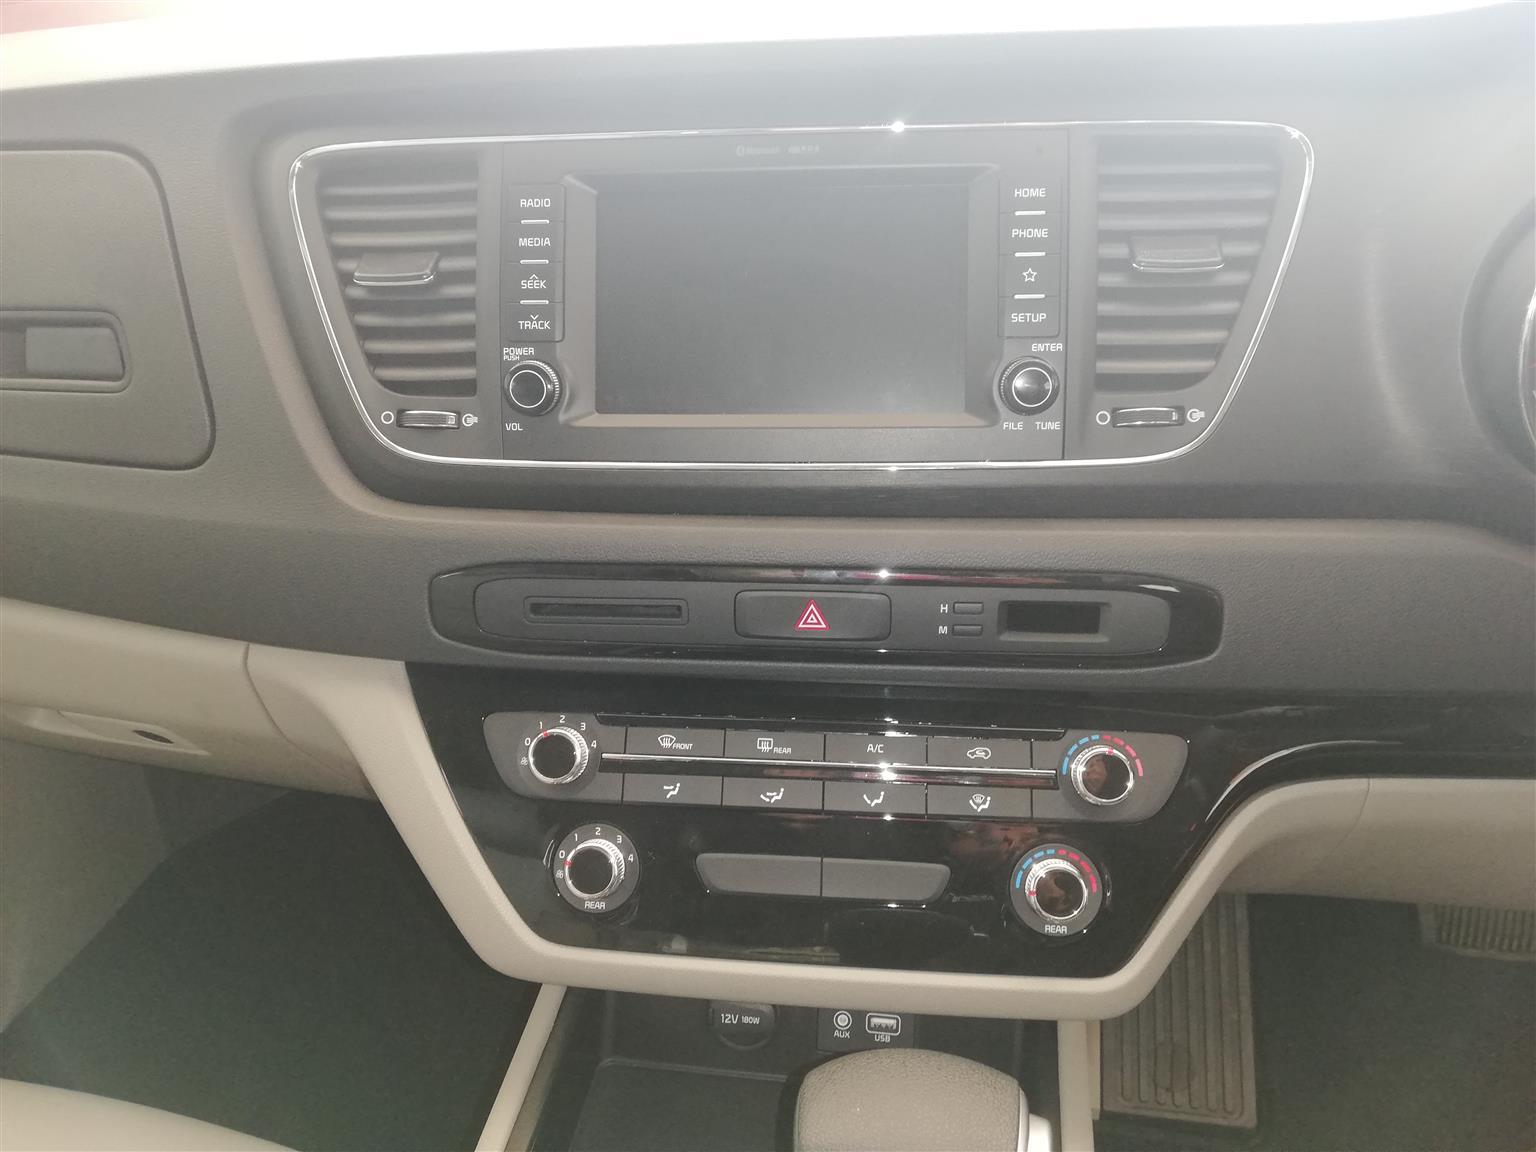 2019 Kia Sedona 2.2CRDi